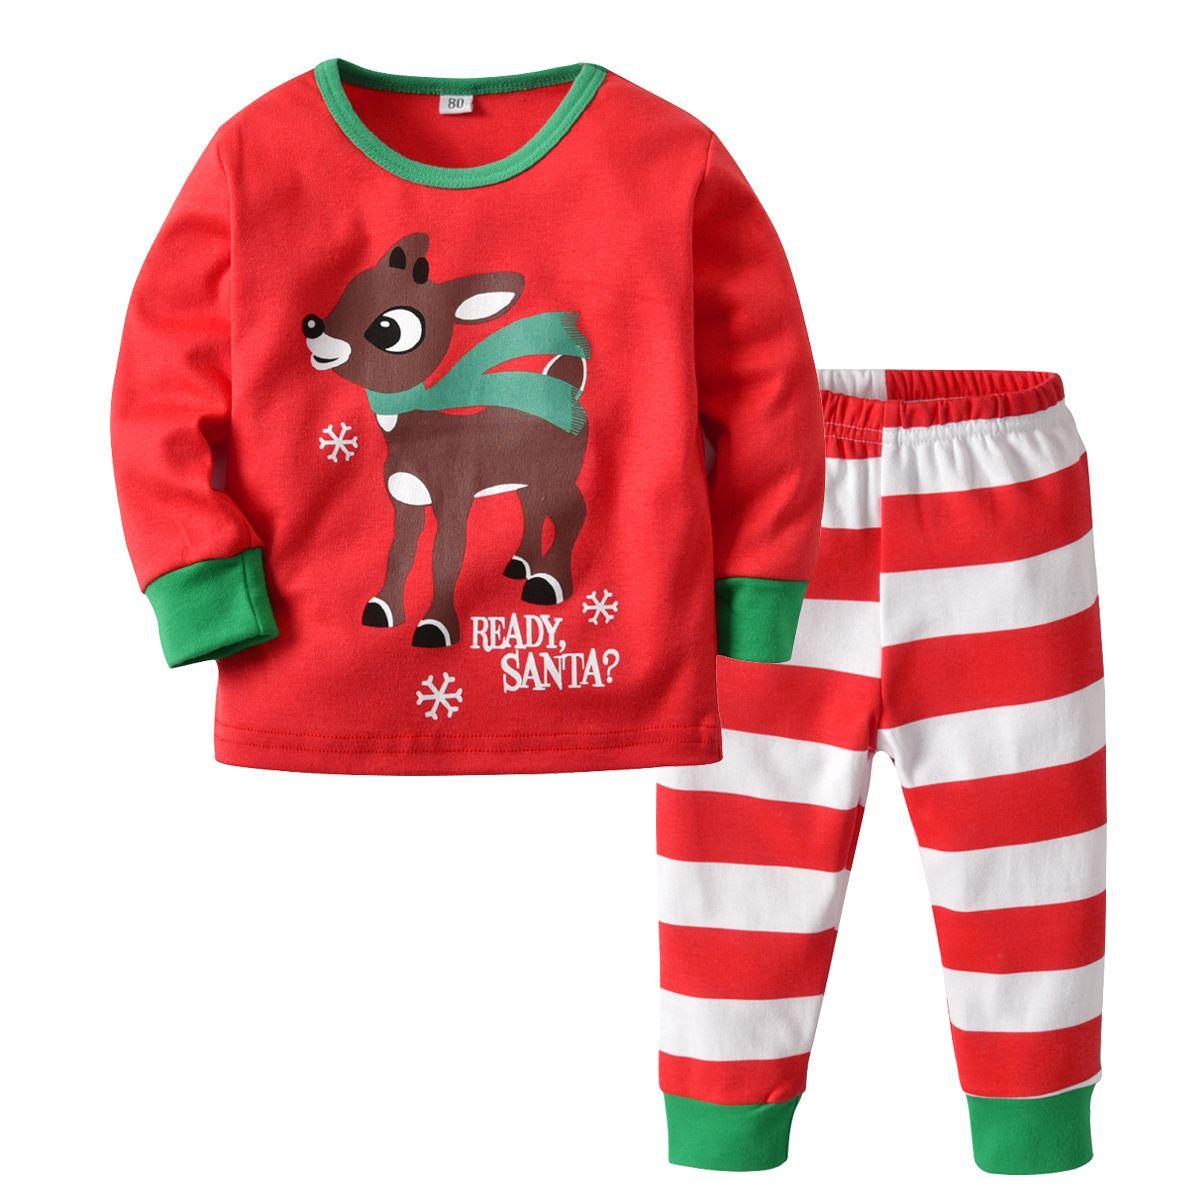 c8dc6180f850 2019 Children Clothing Sets Spring Autumn Baby Boys Girls Cute ...